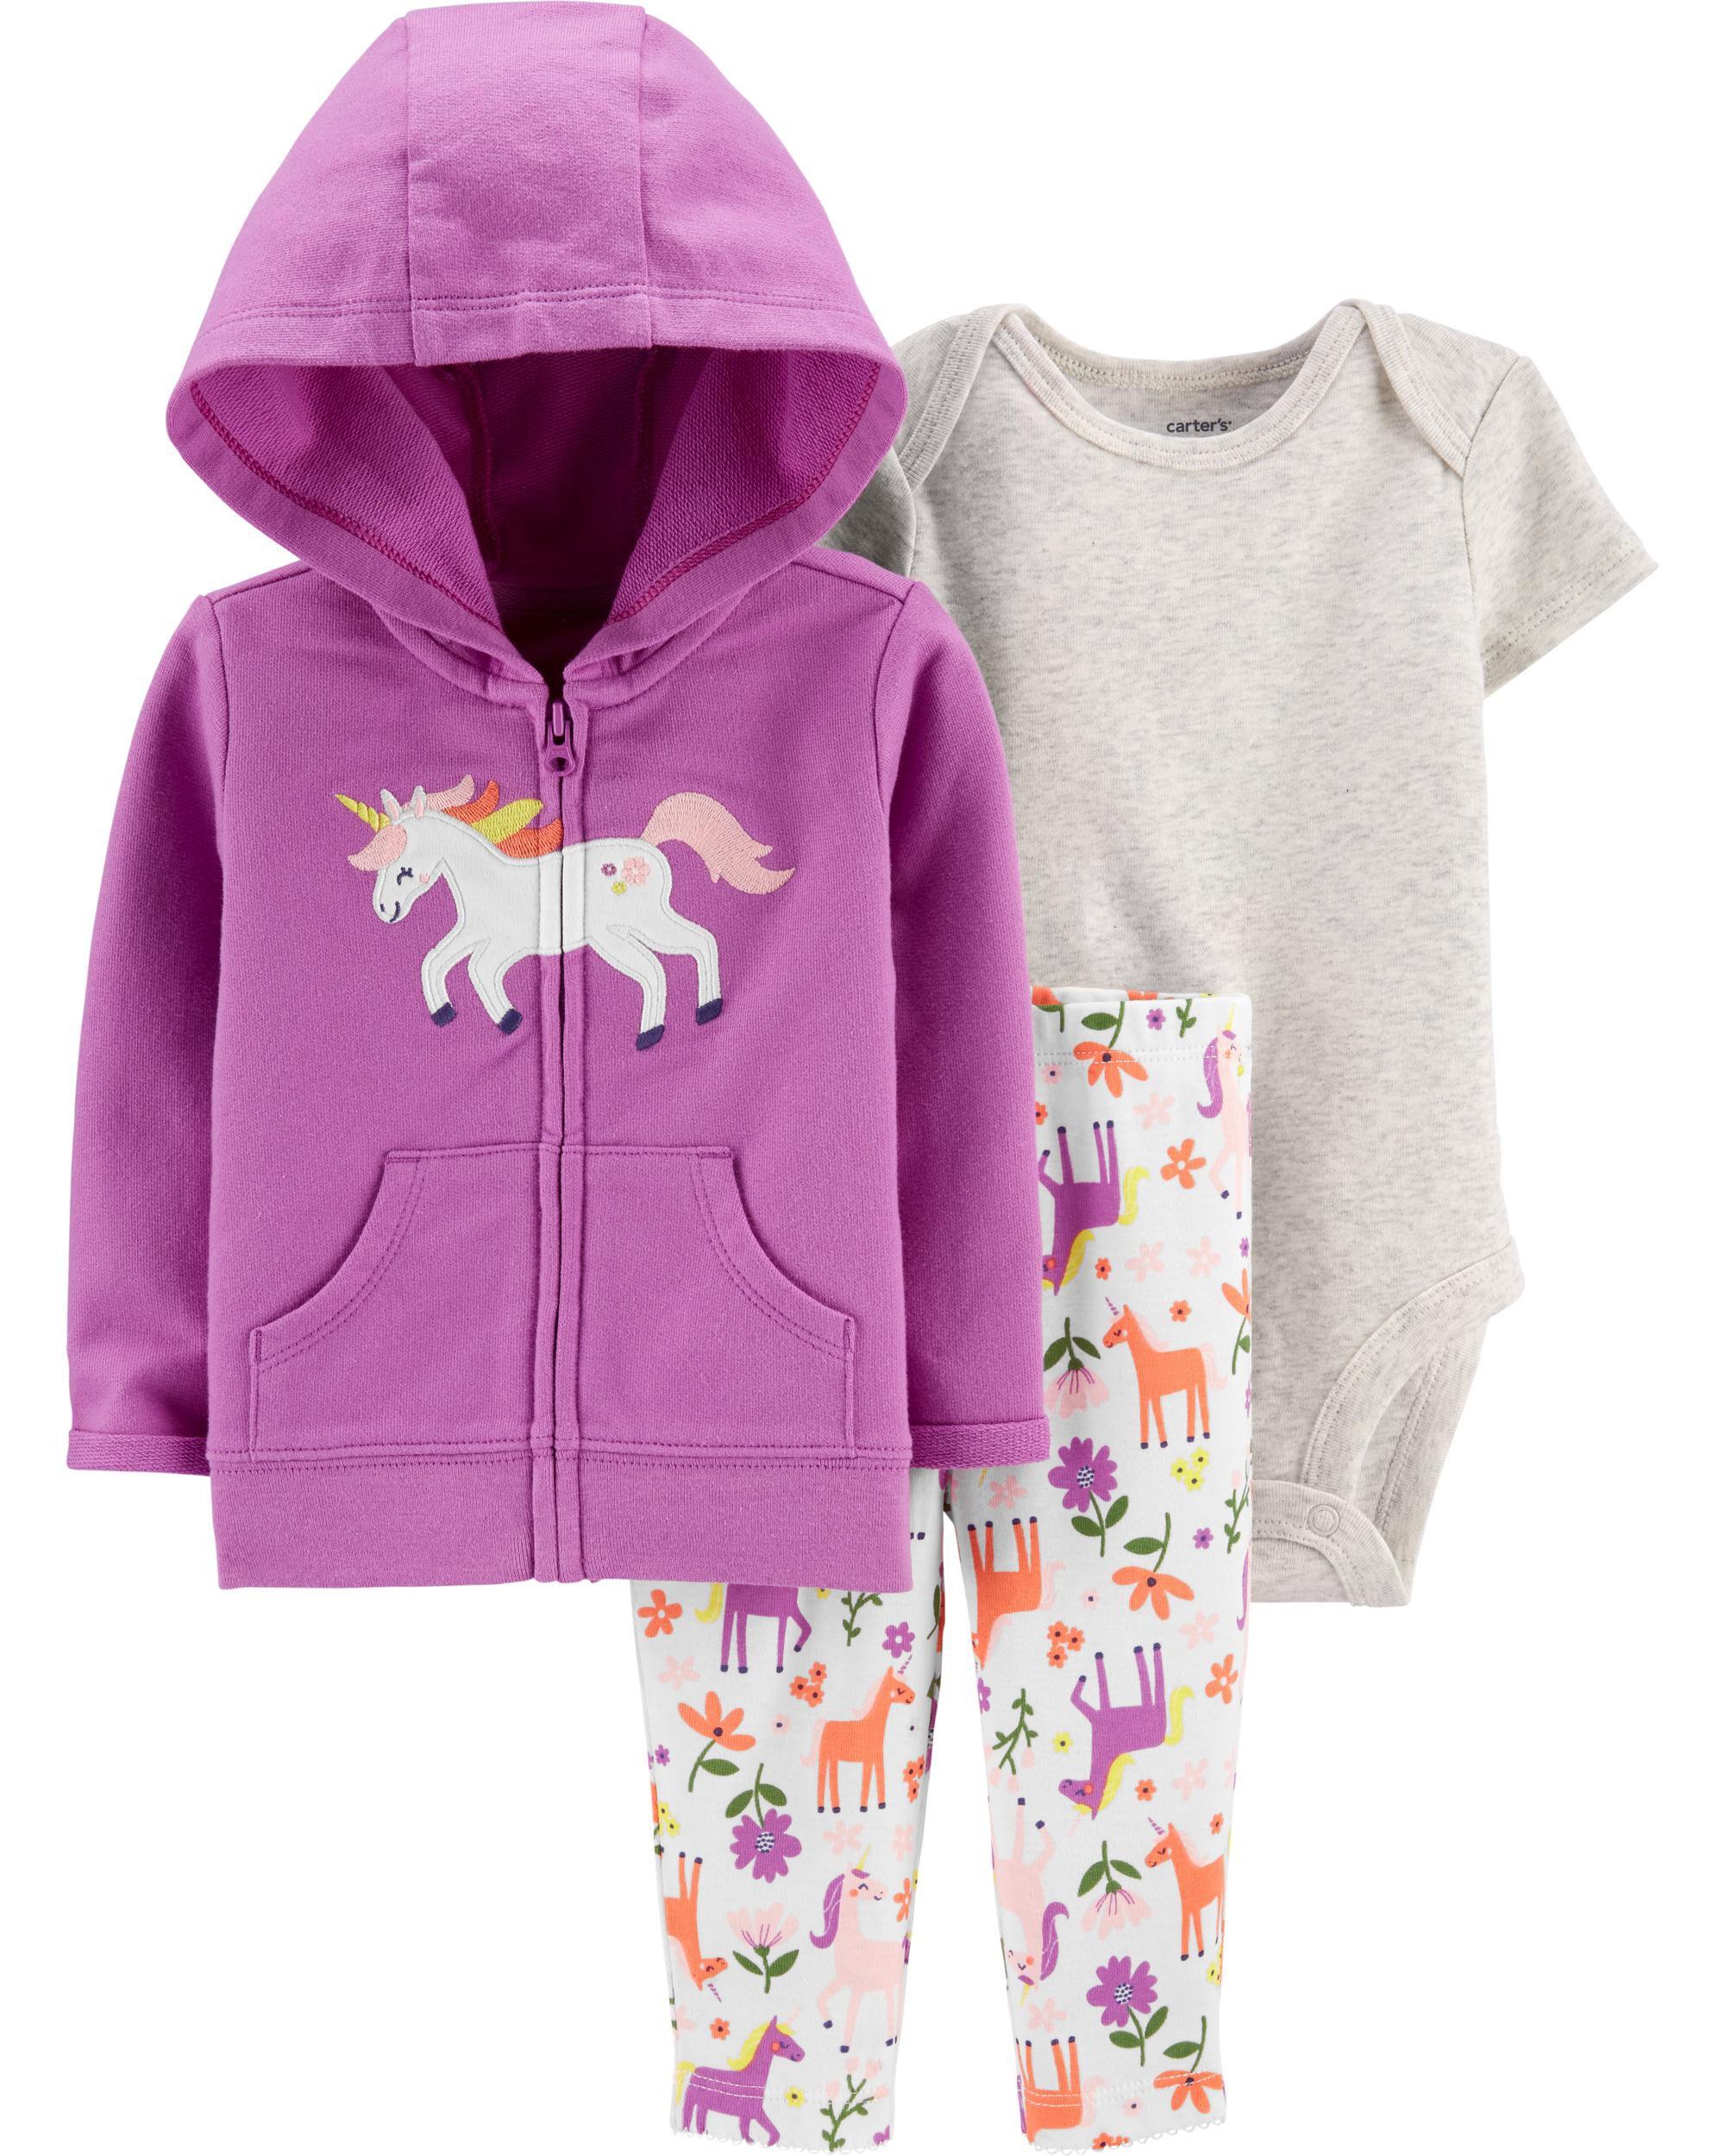 *CLEARANCE* 3-Piece Unicorn Little Jacket Set